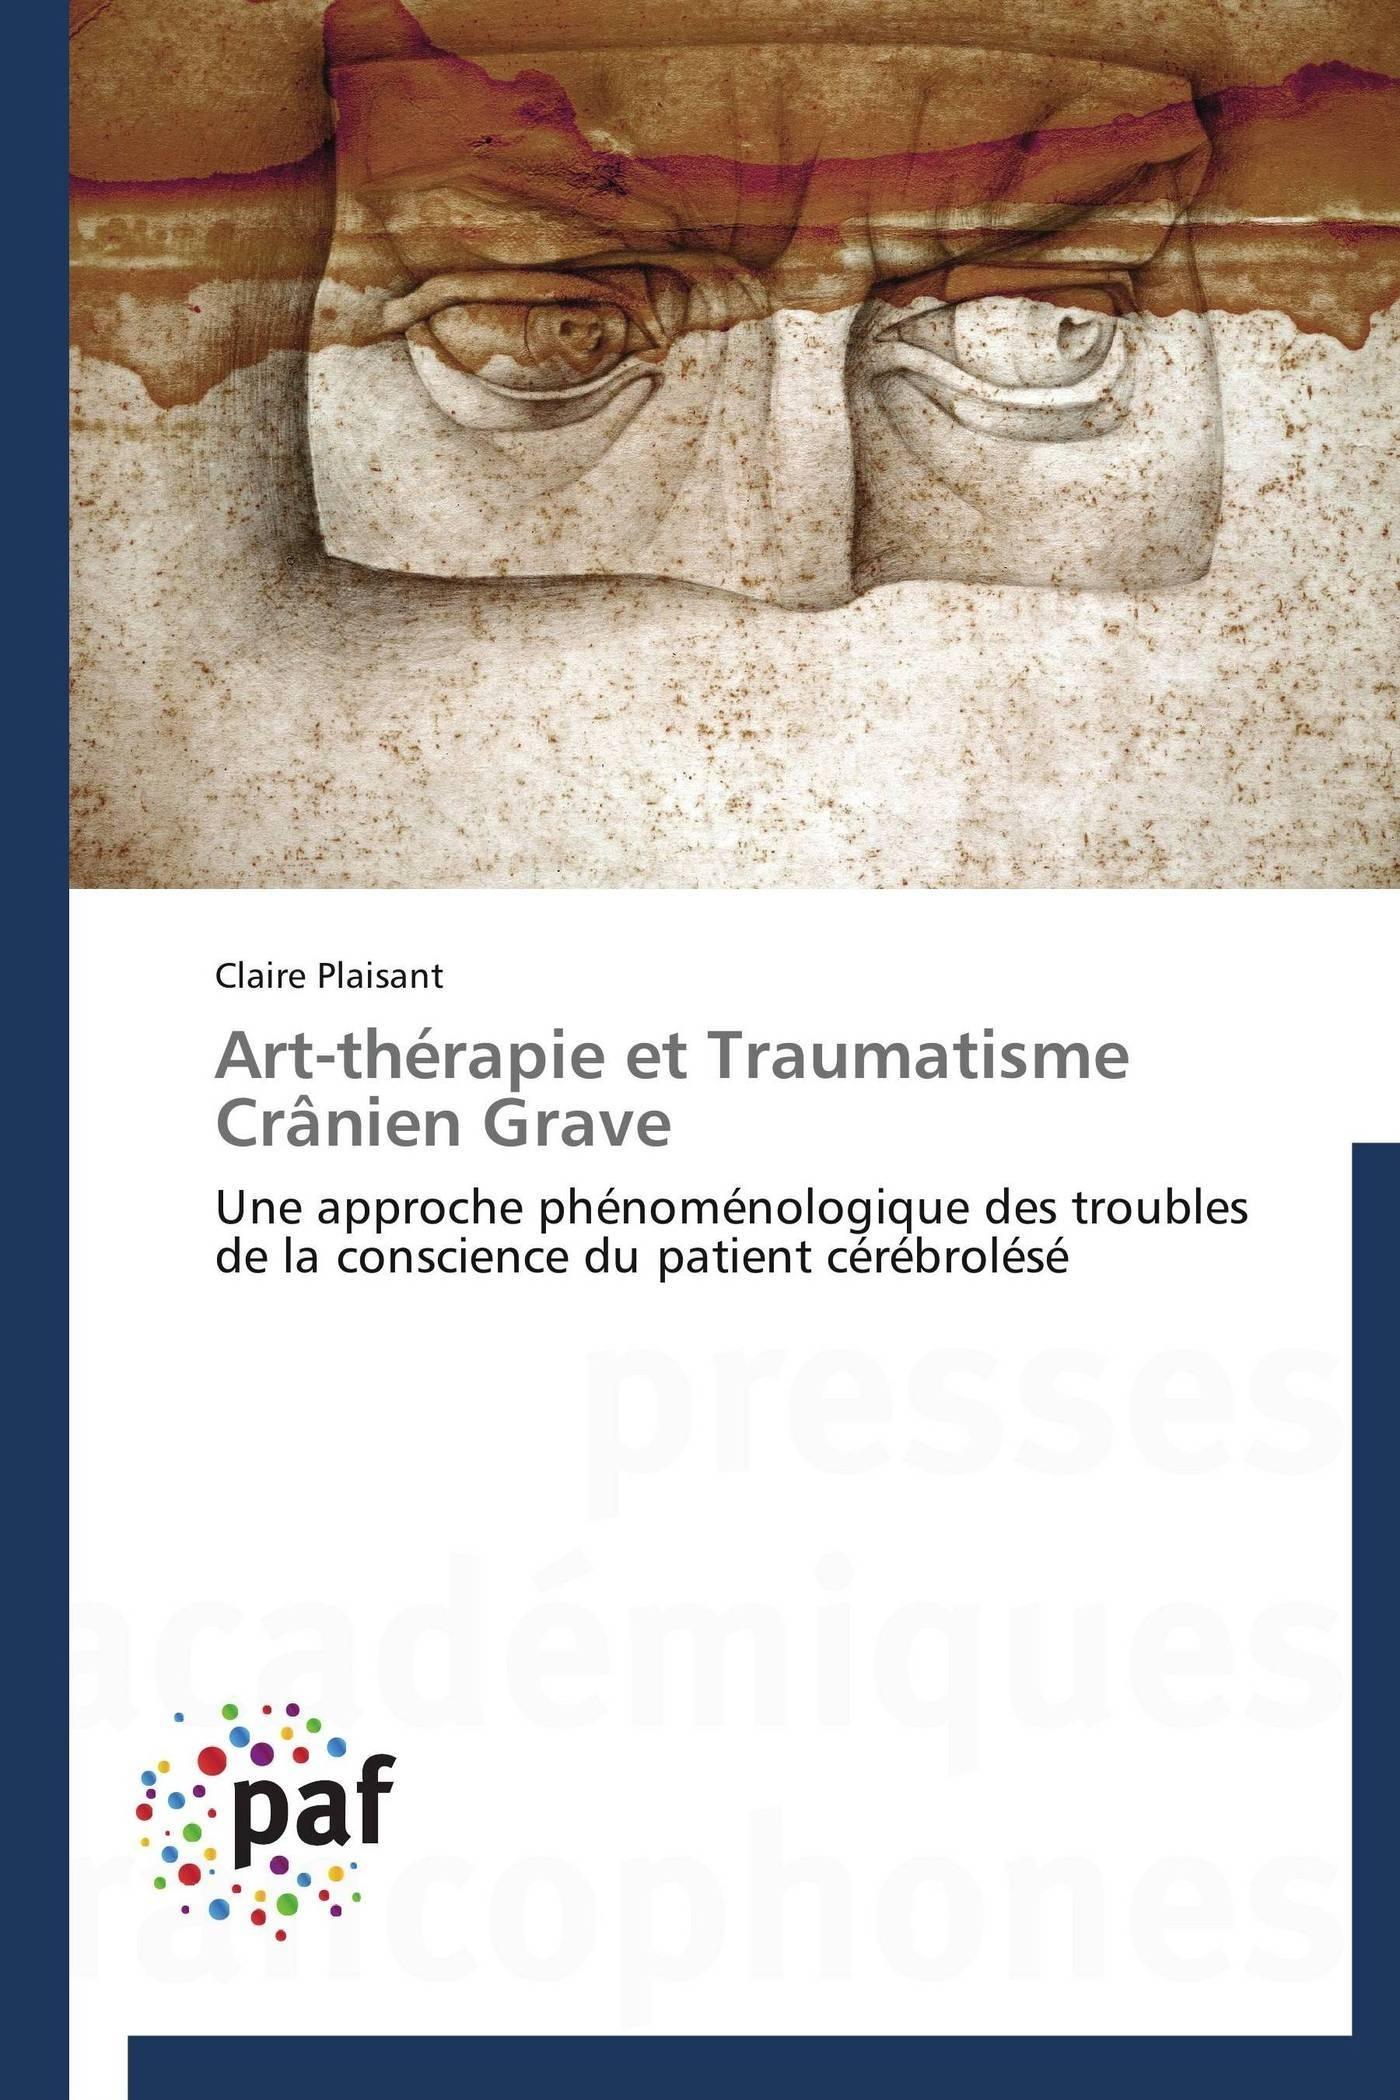 ART-THERAPIE ET TRAUMATISME CRANIEN GRAVE